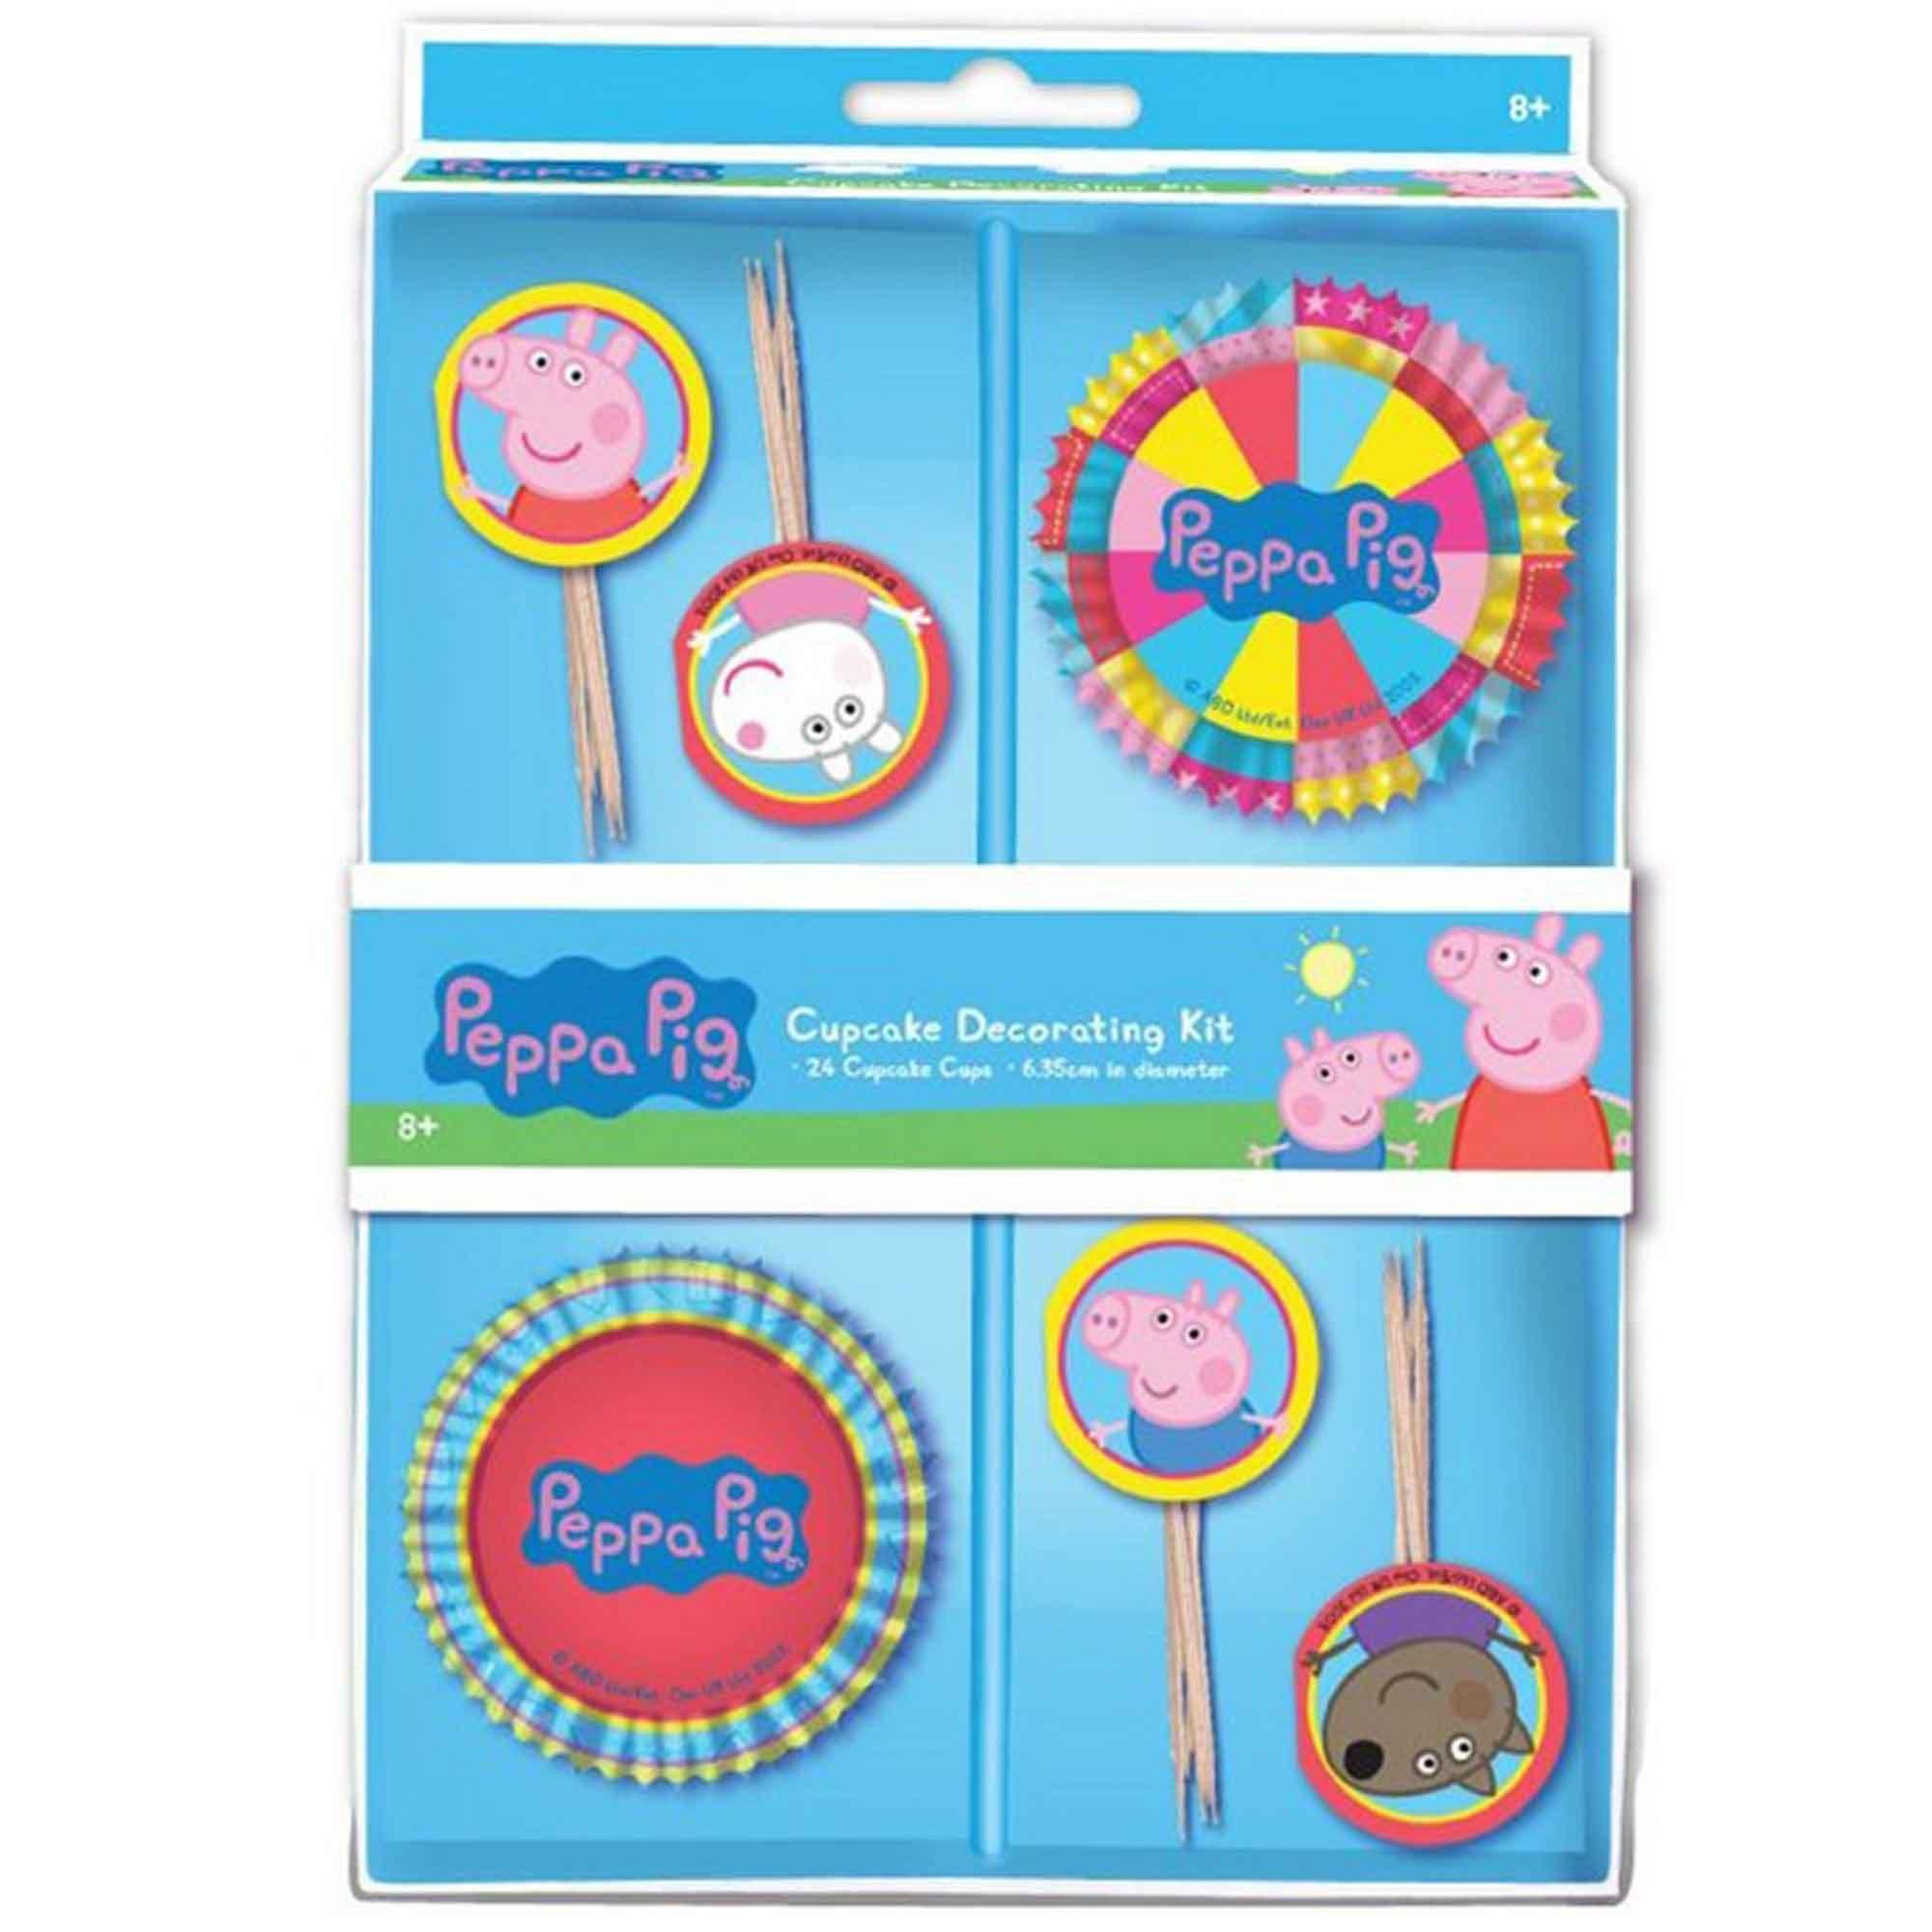 Peppa Pig Cupcake Decorations Kit